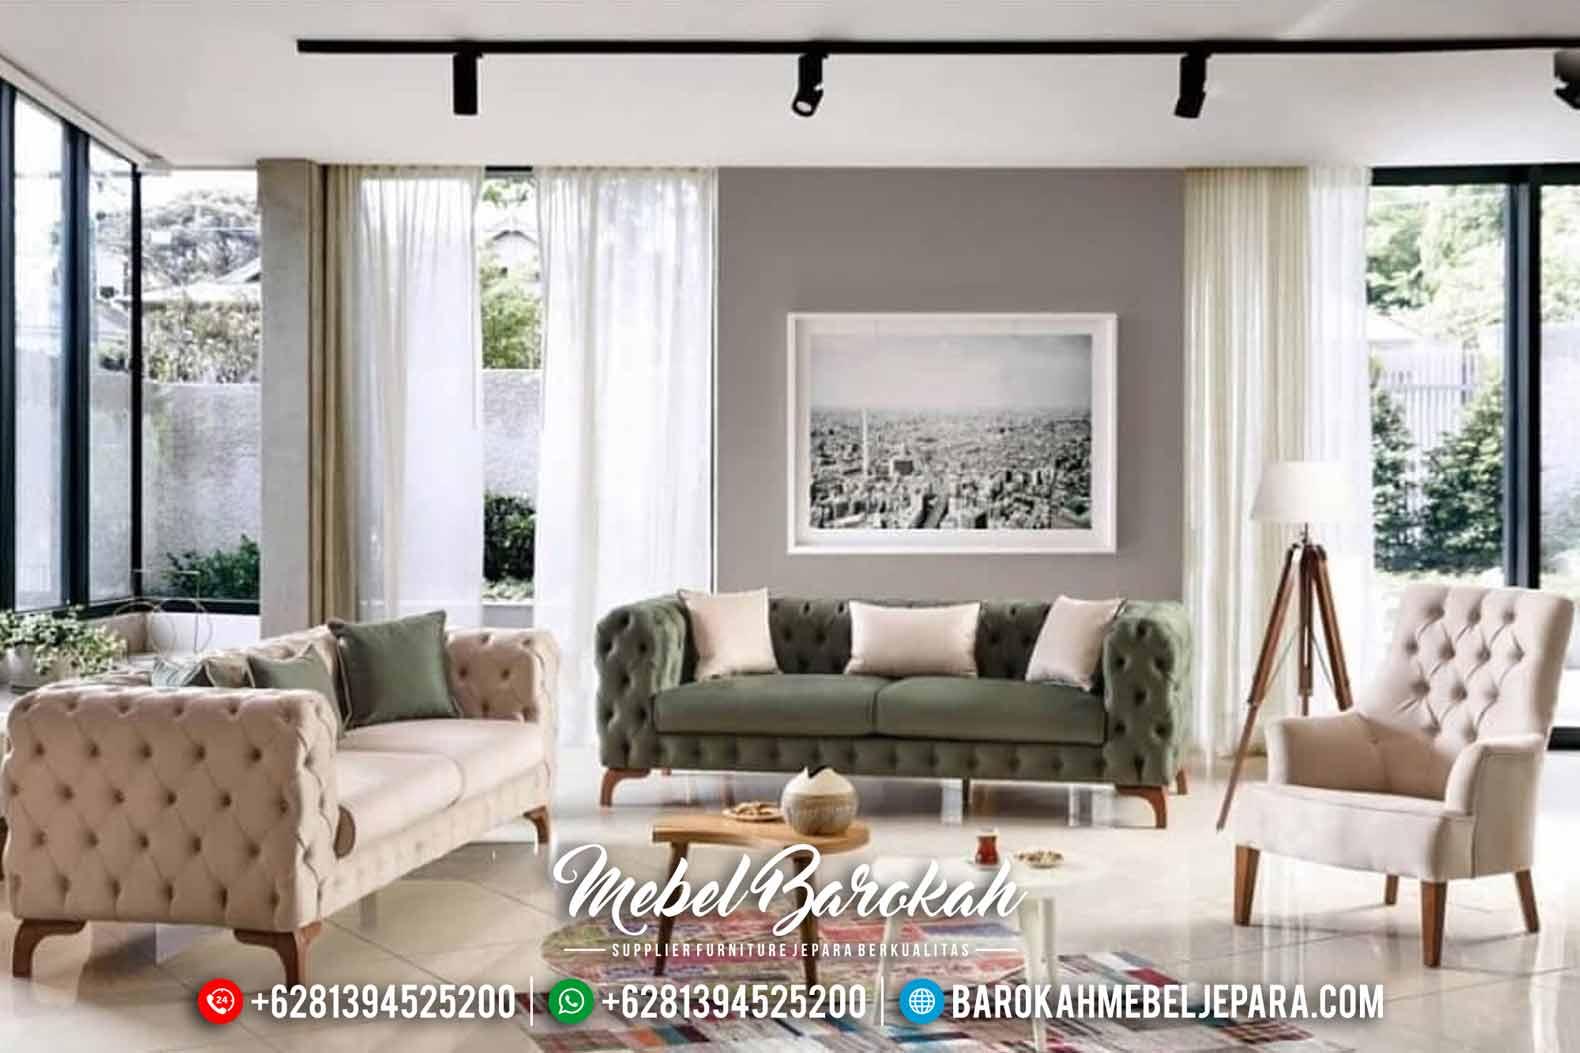 Sofa Tamu Modern Minimalis Chesterfield New Design 2020 MB-0452